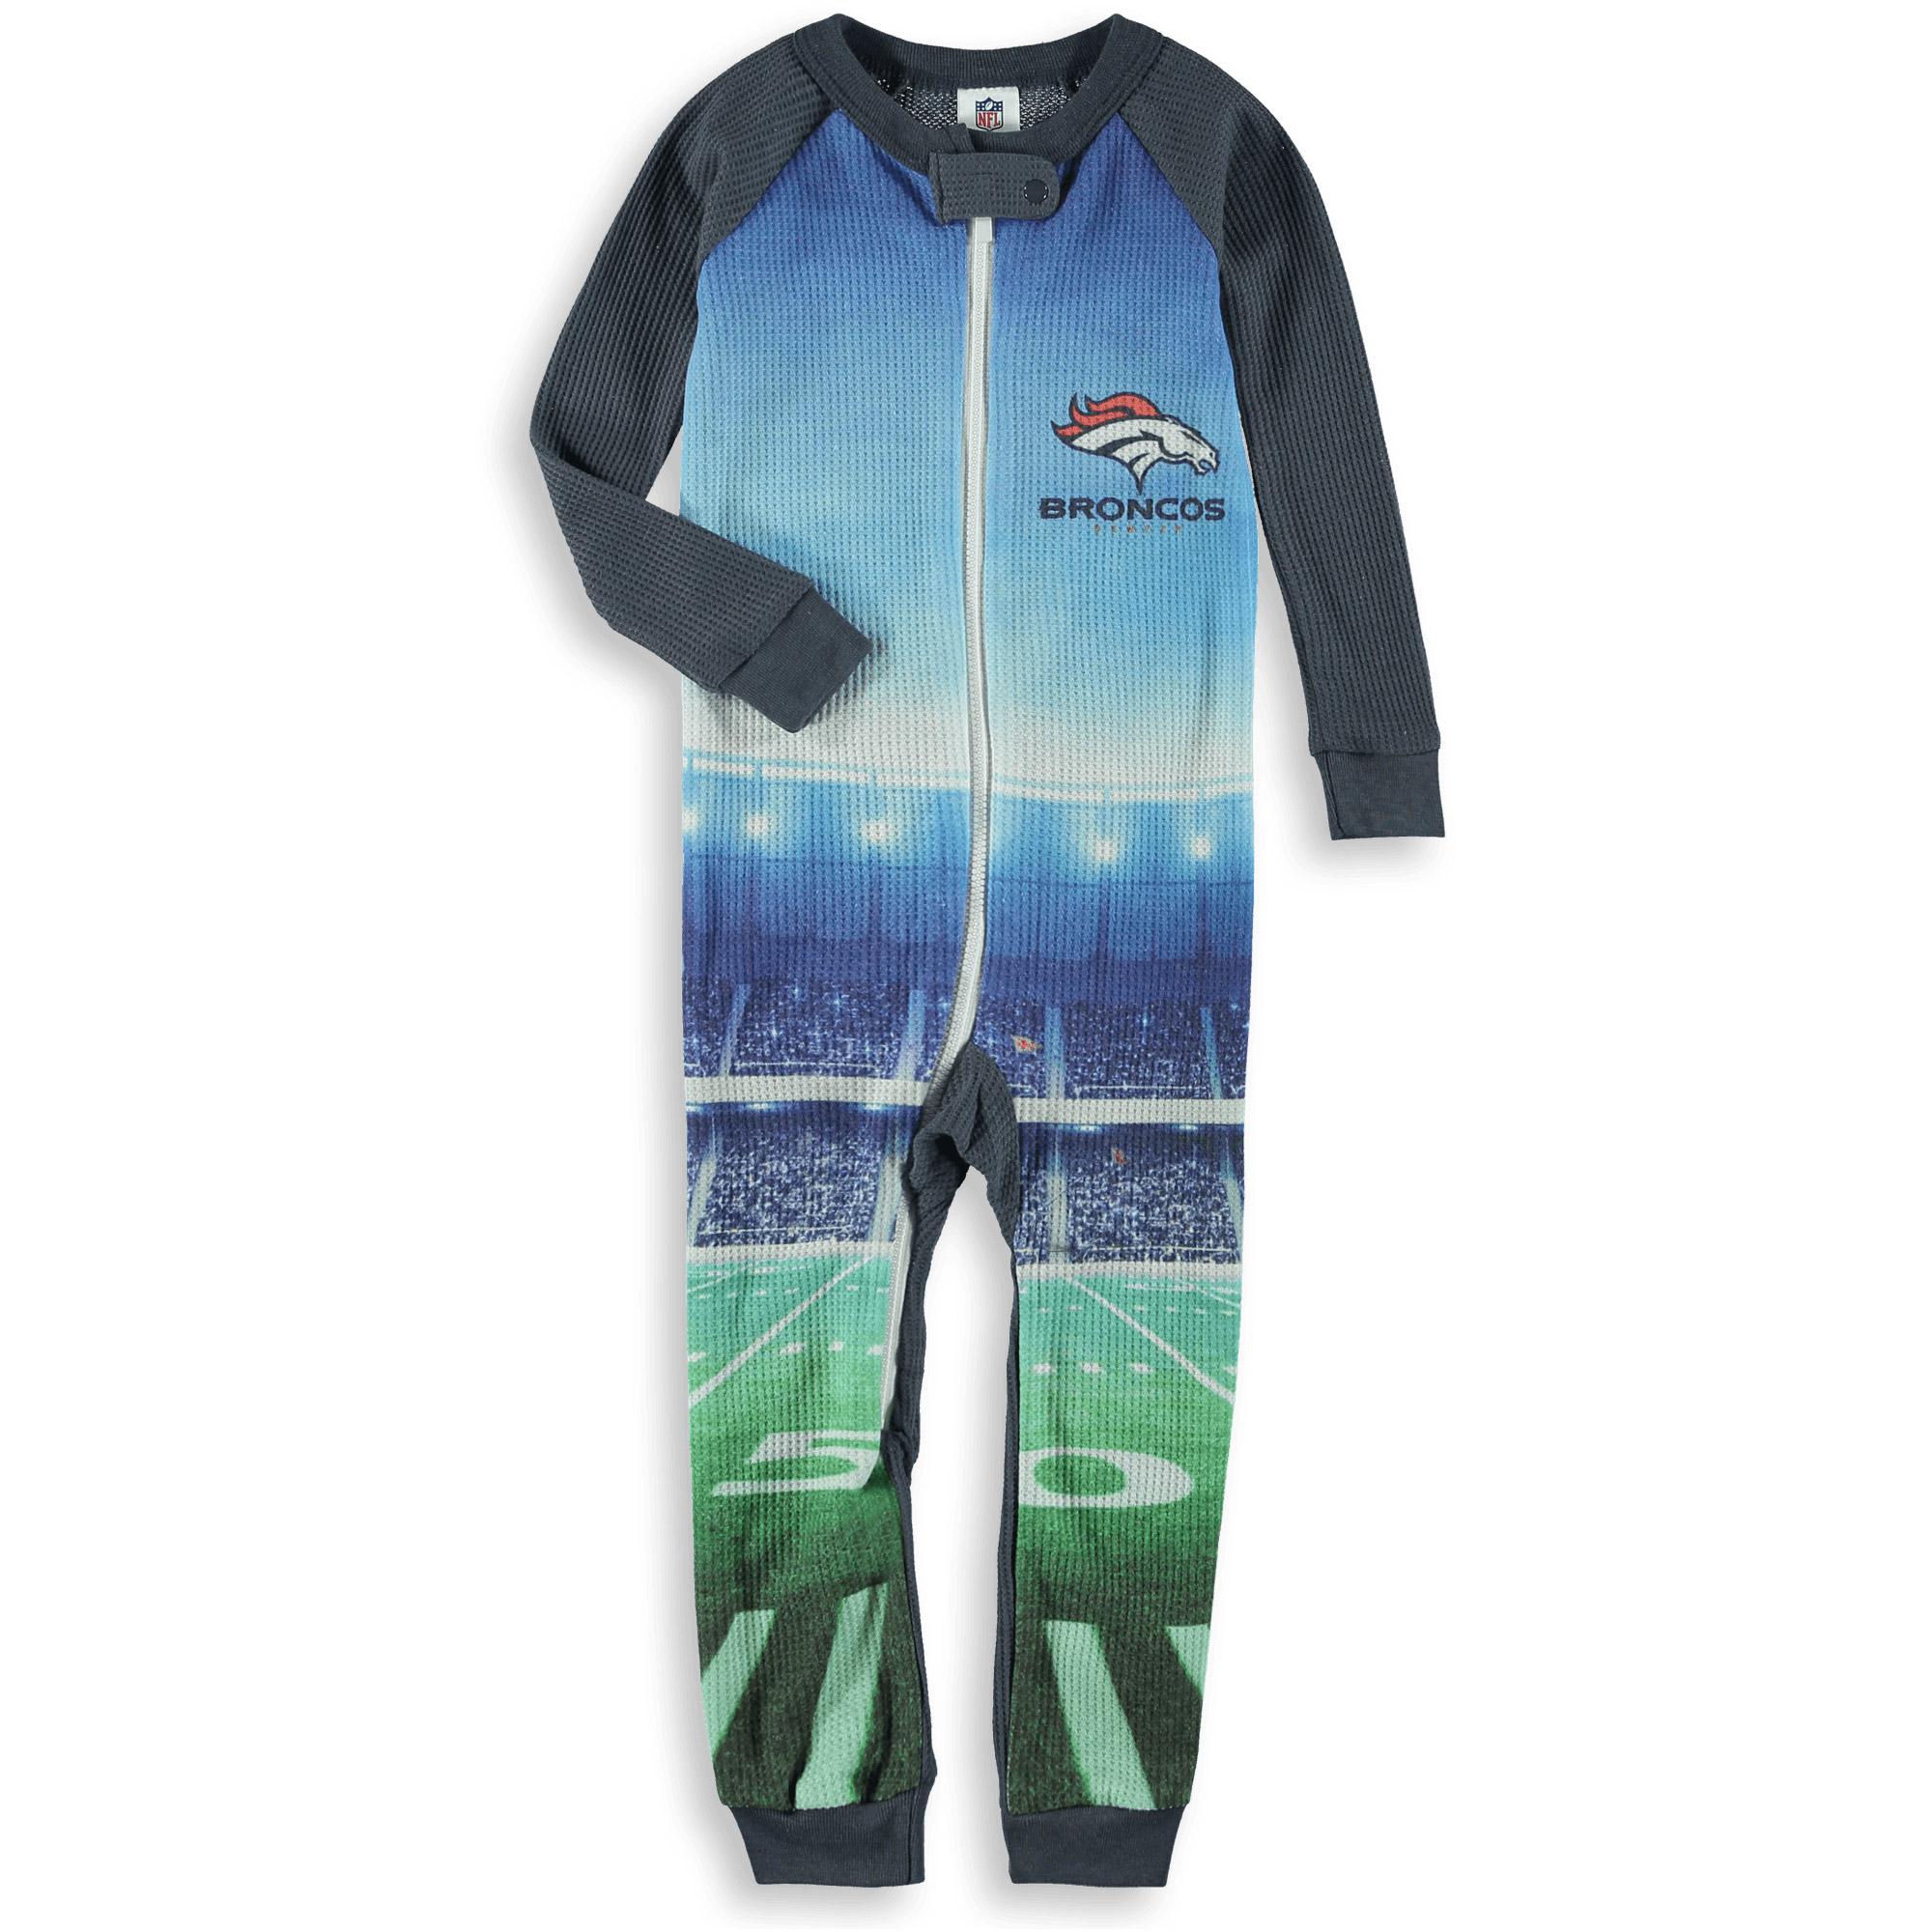 Denver Broncos Gerber Infant Union Suit Jumper - Gray